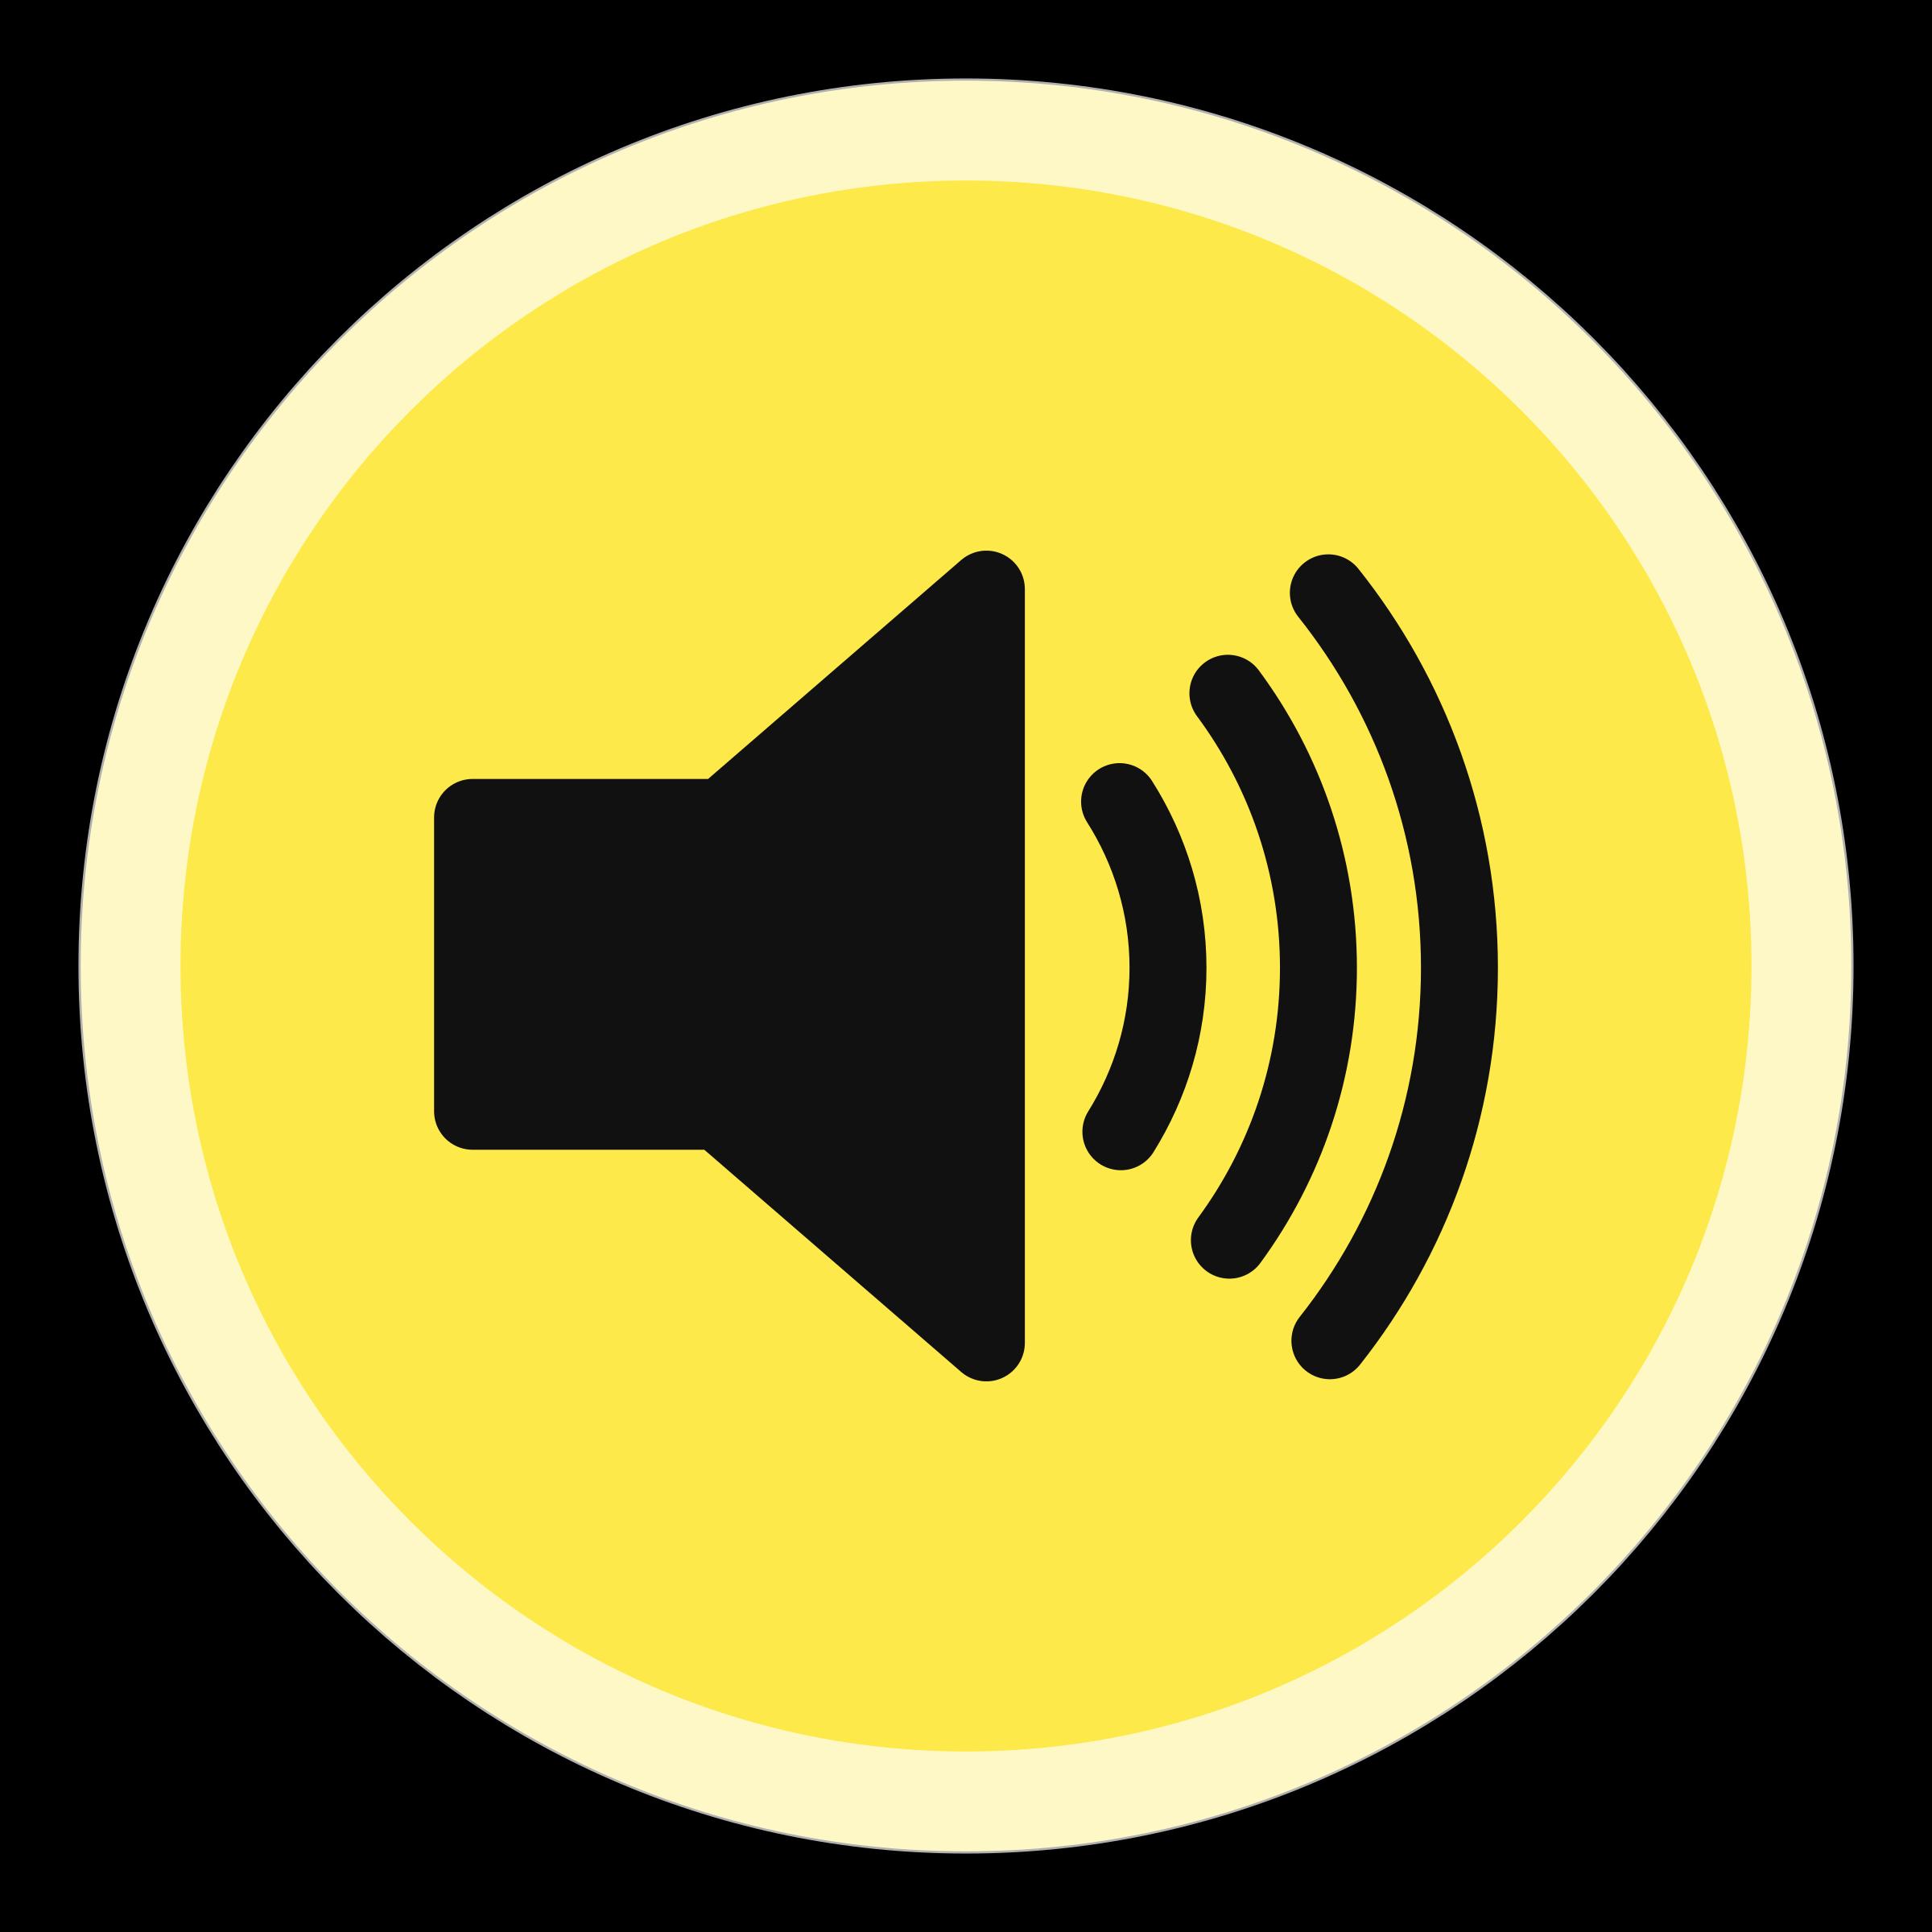 Speakers clipart volume button, Speakers volume button.